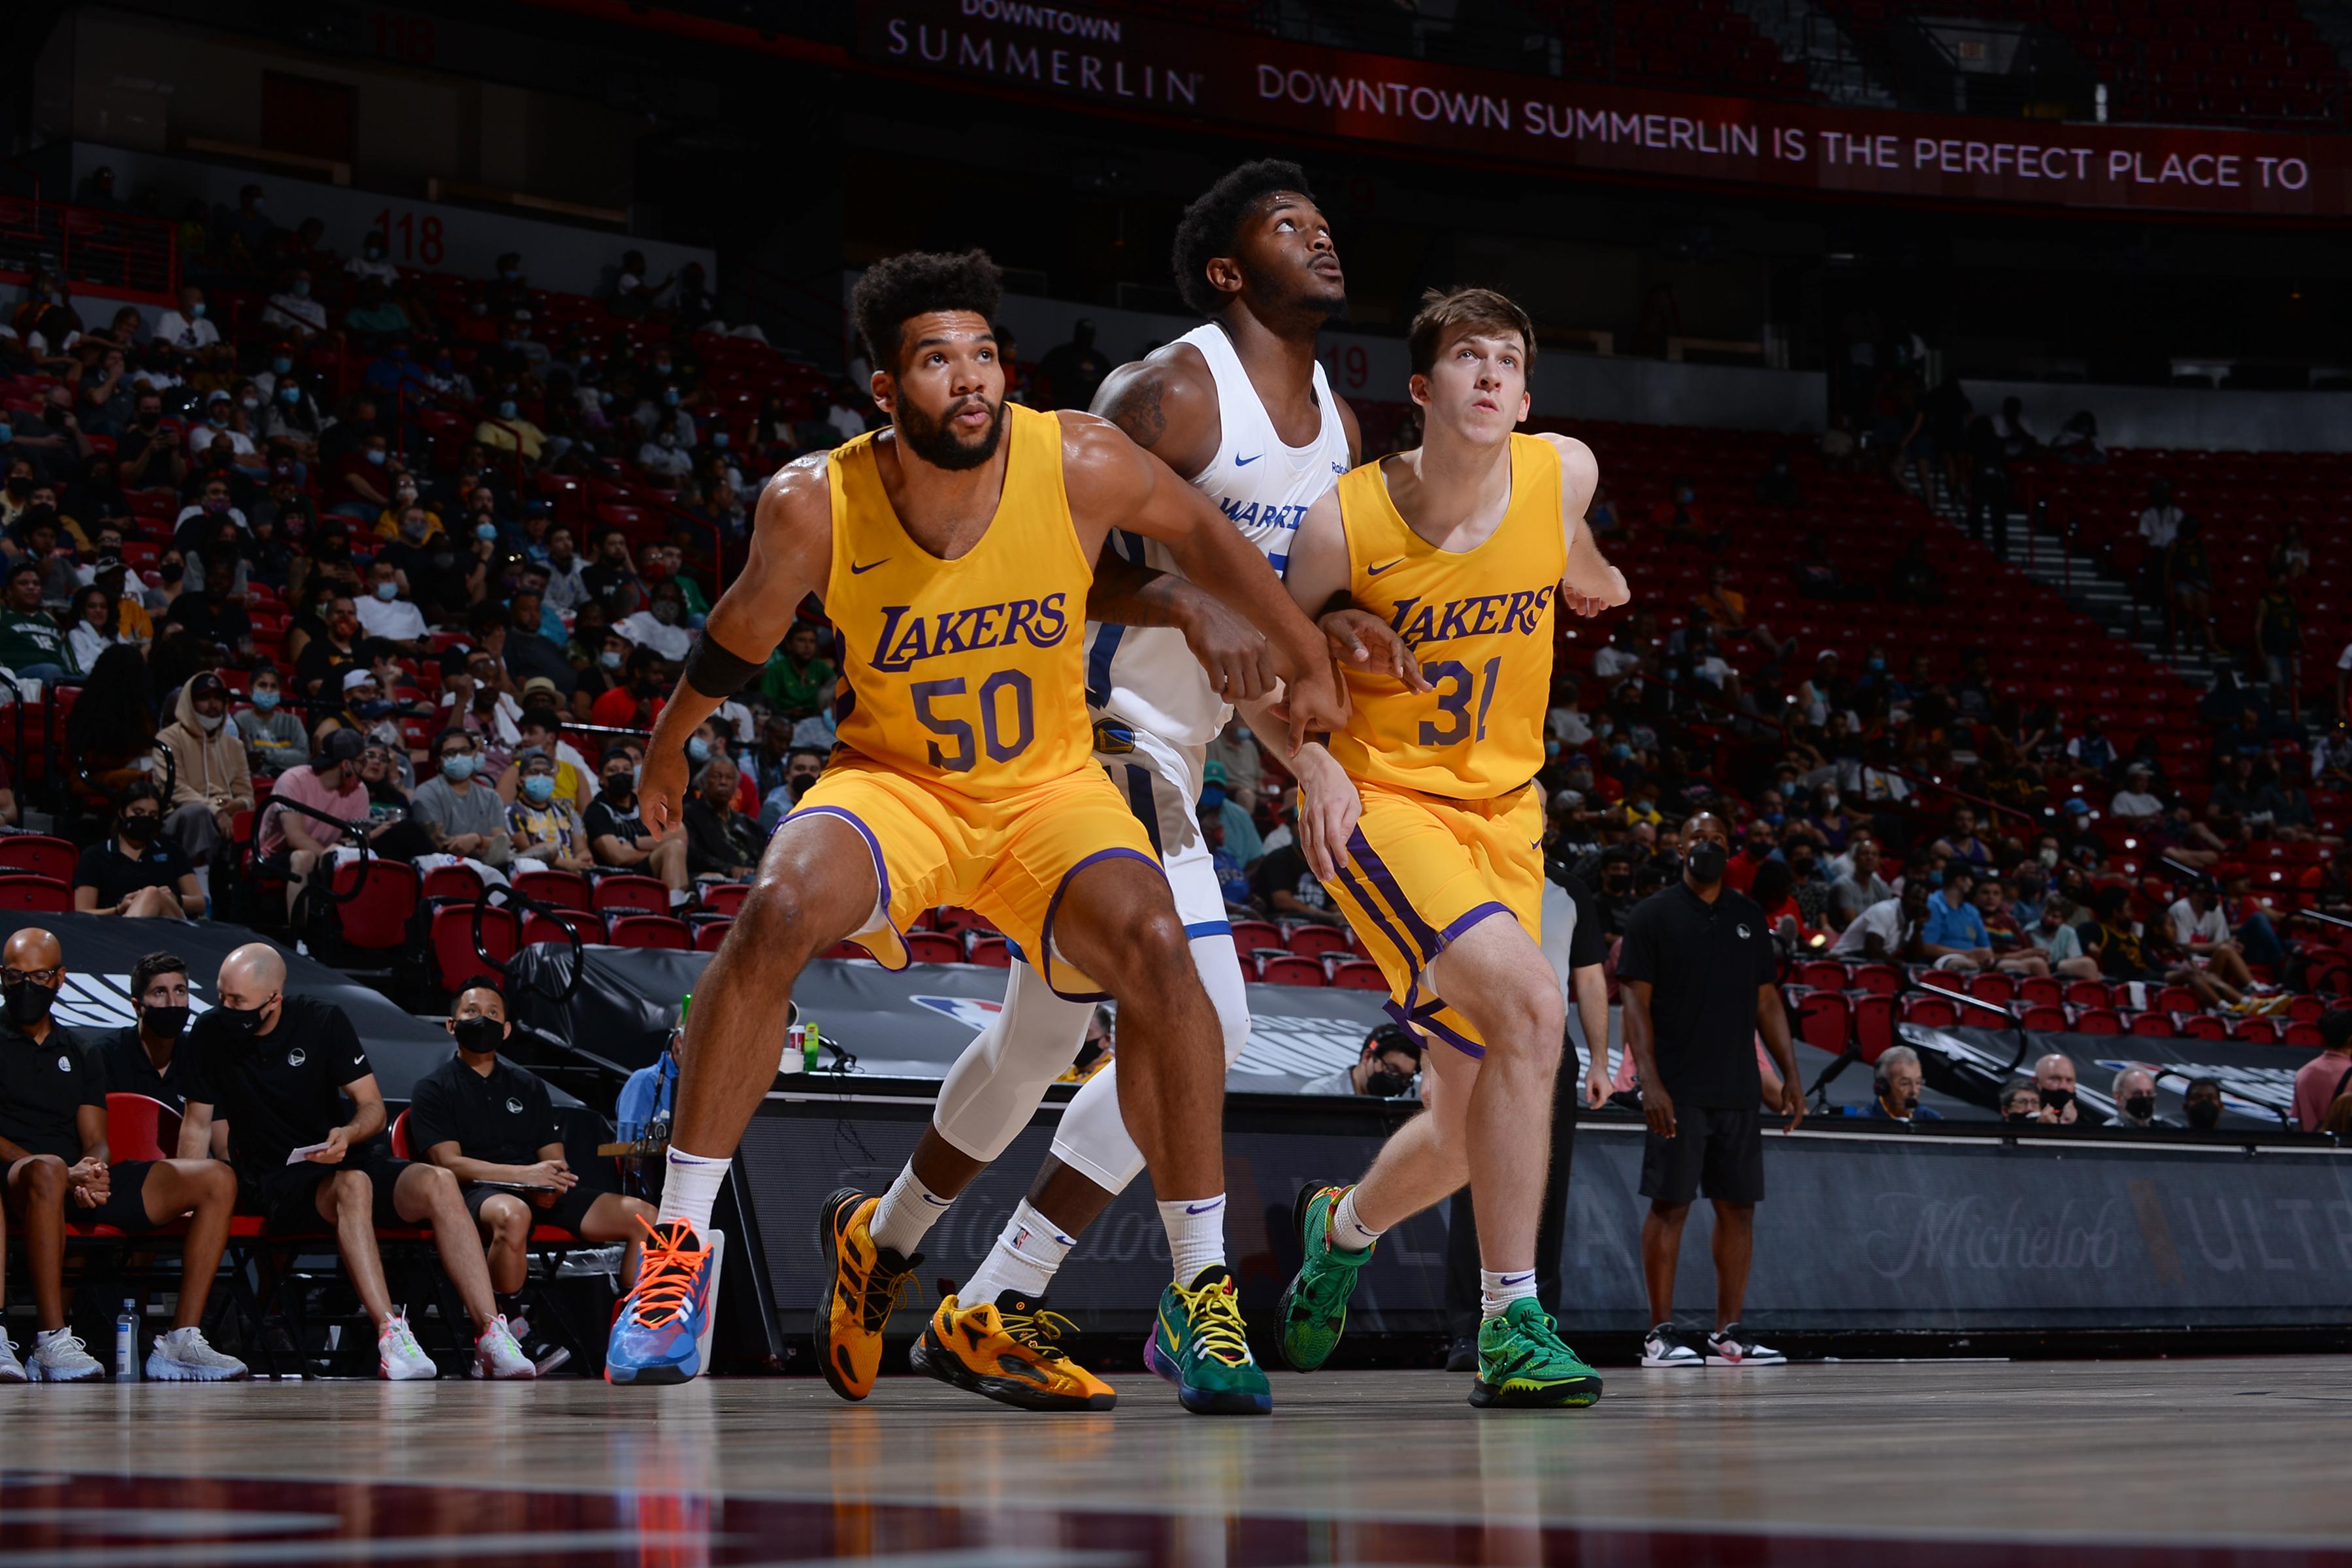 2021 Las Vegas Summer League - Los Angeles Lakers v Golden State Warriors